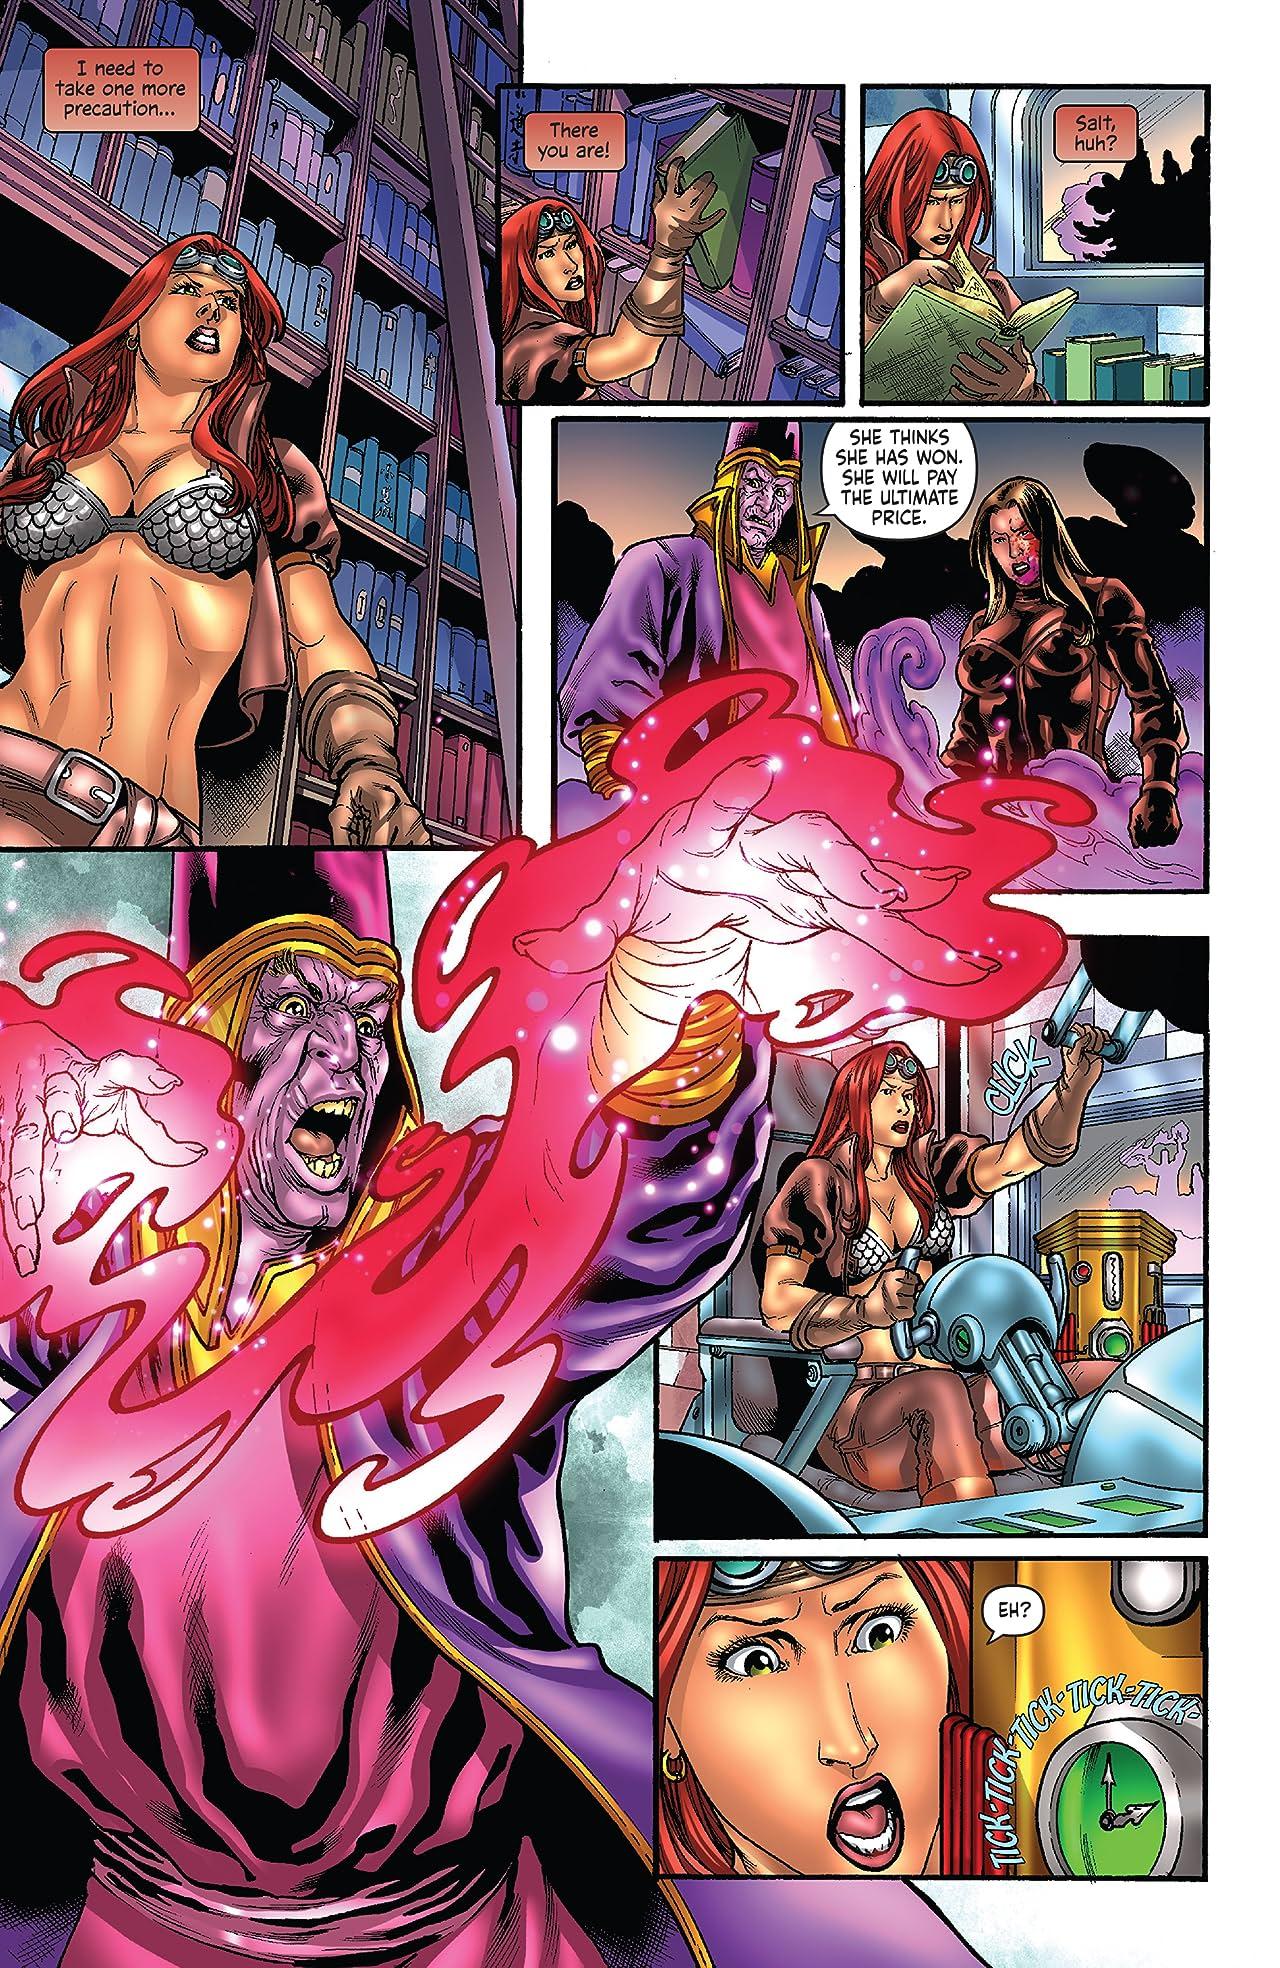 Legenderry: Red Sonja #5